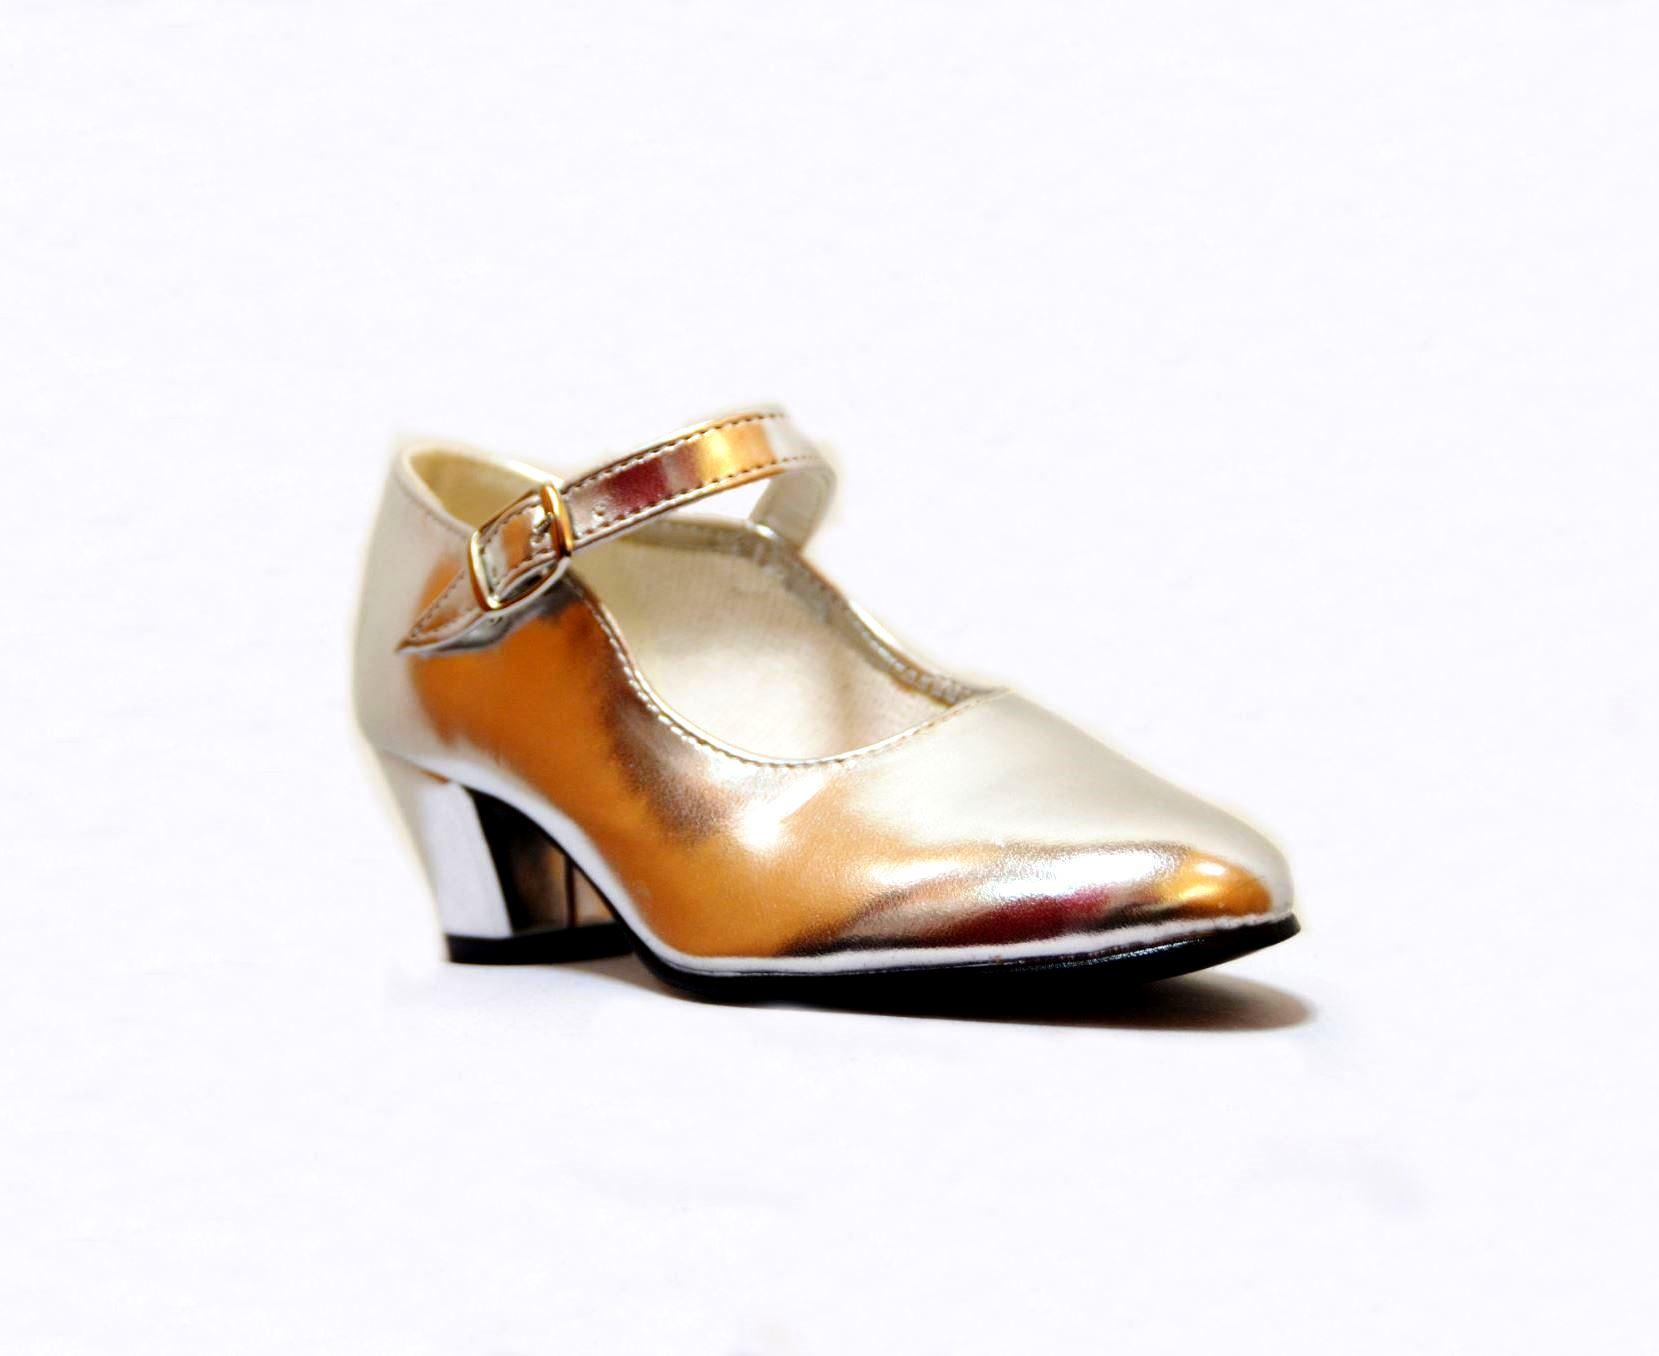 Zapato dorado economico